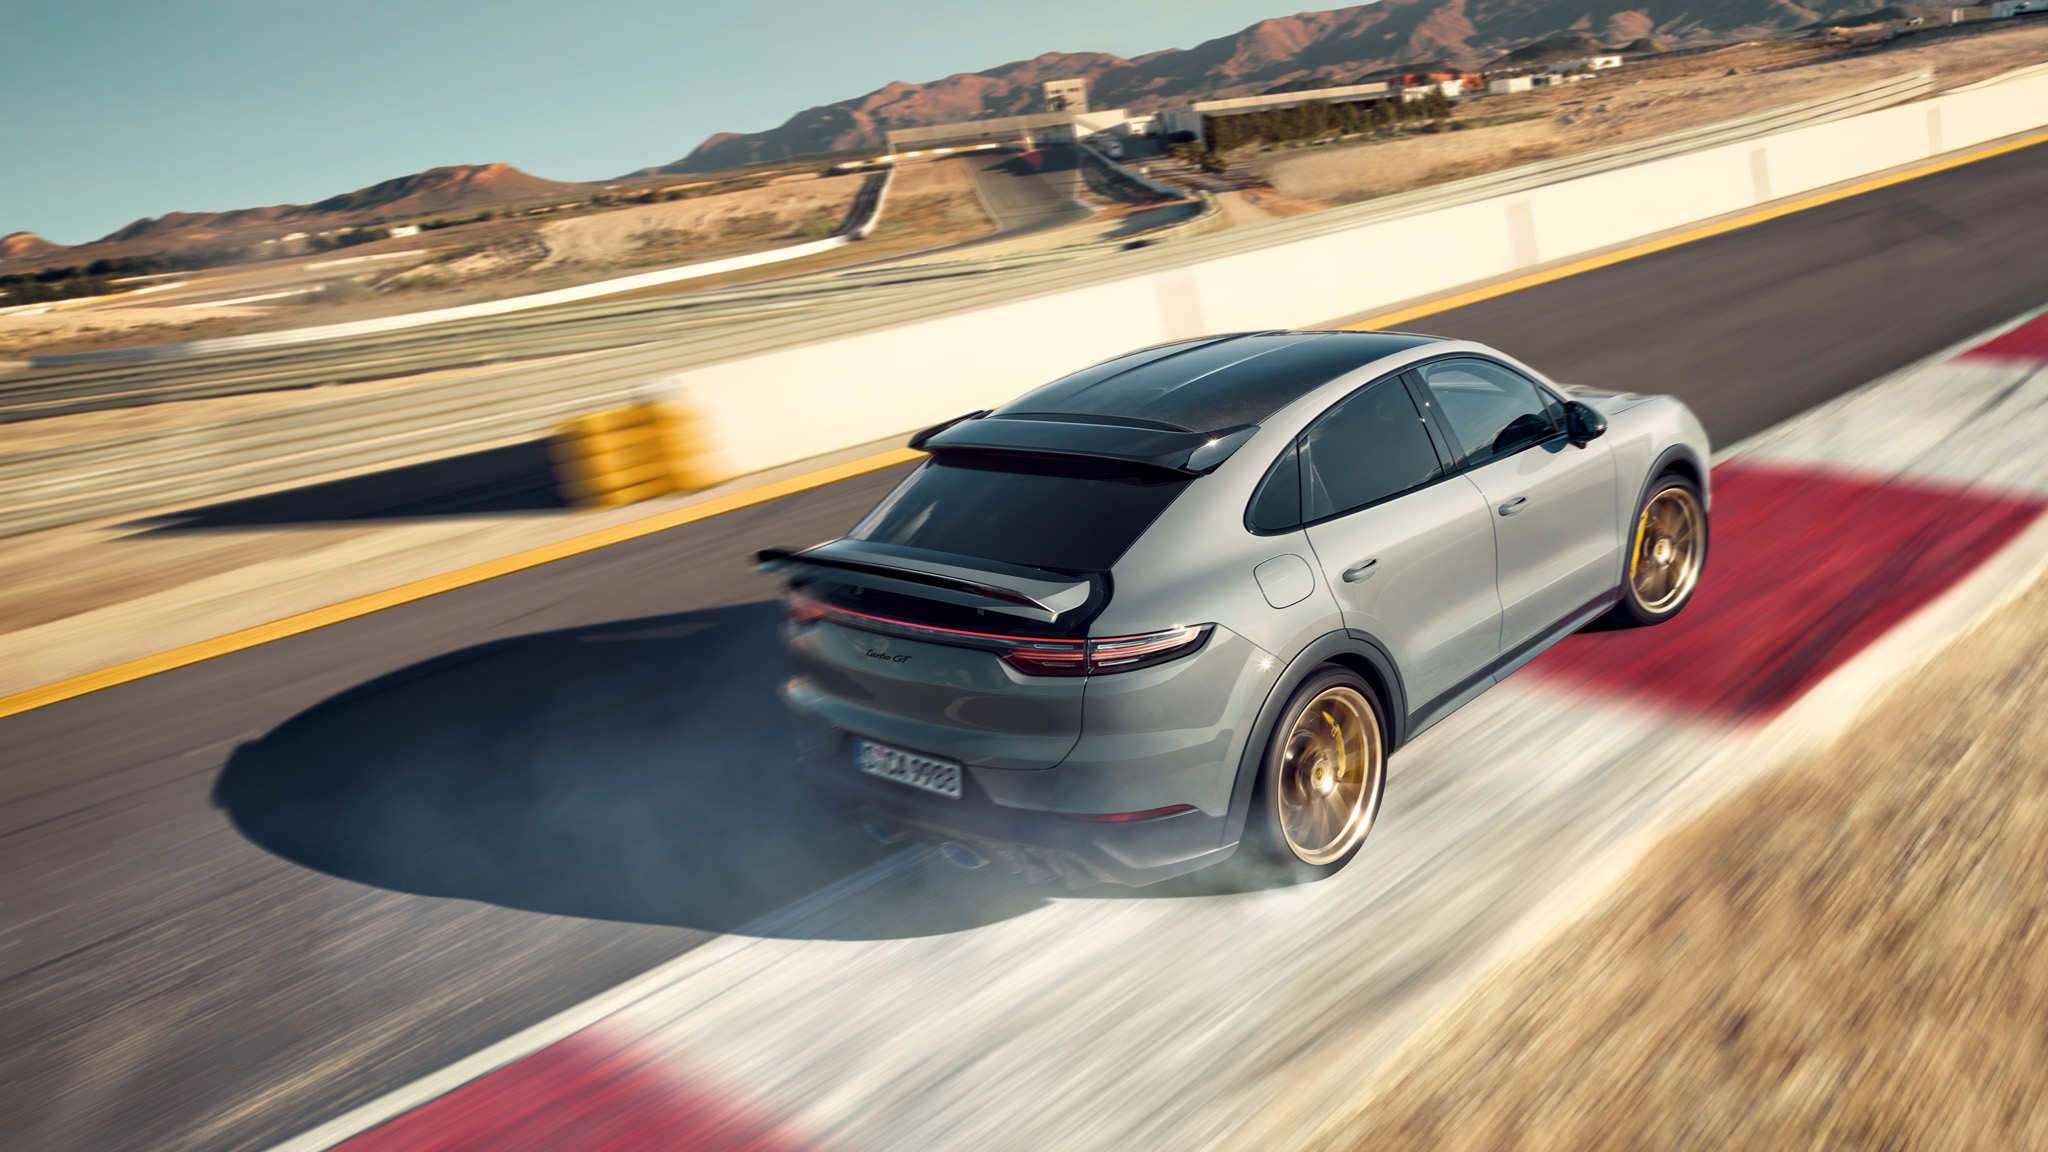 La nuova Cayenne Turbo GT